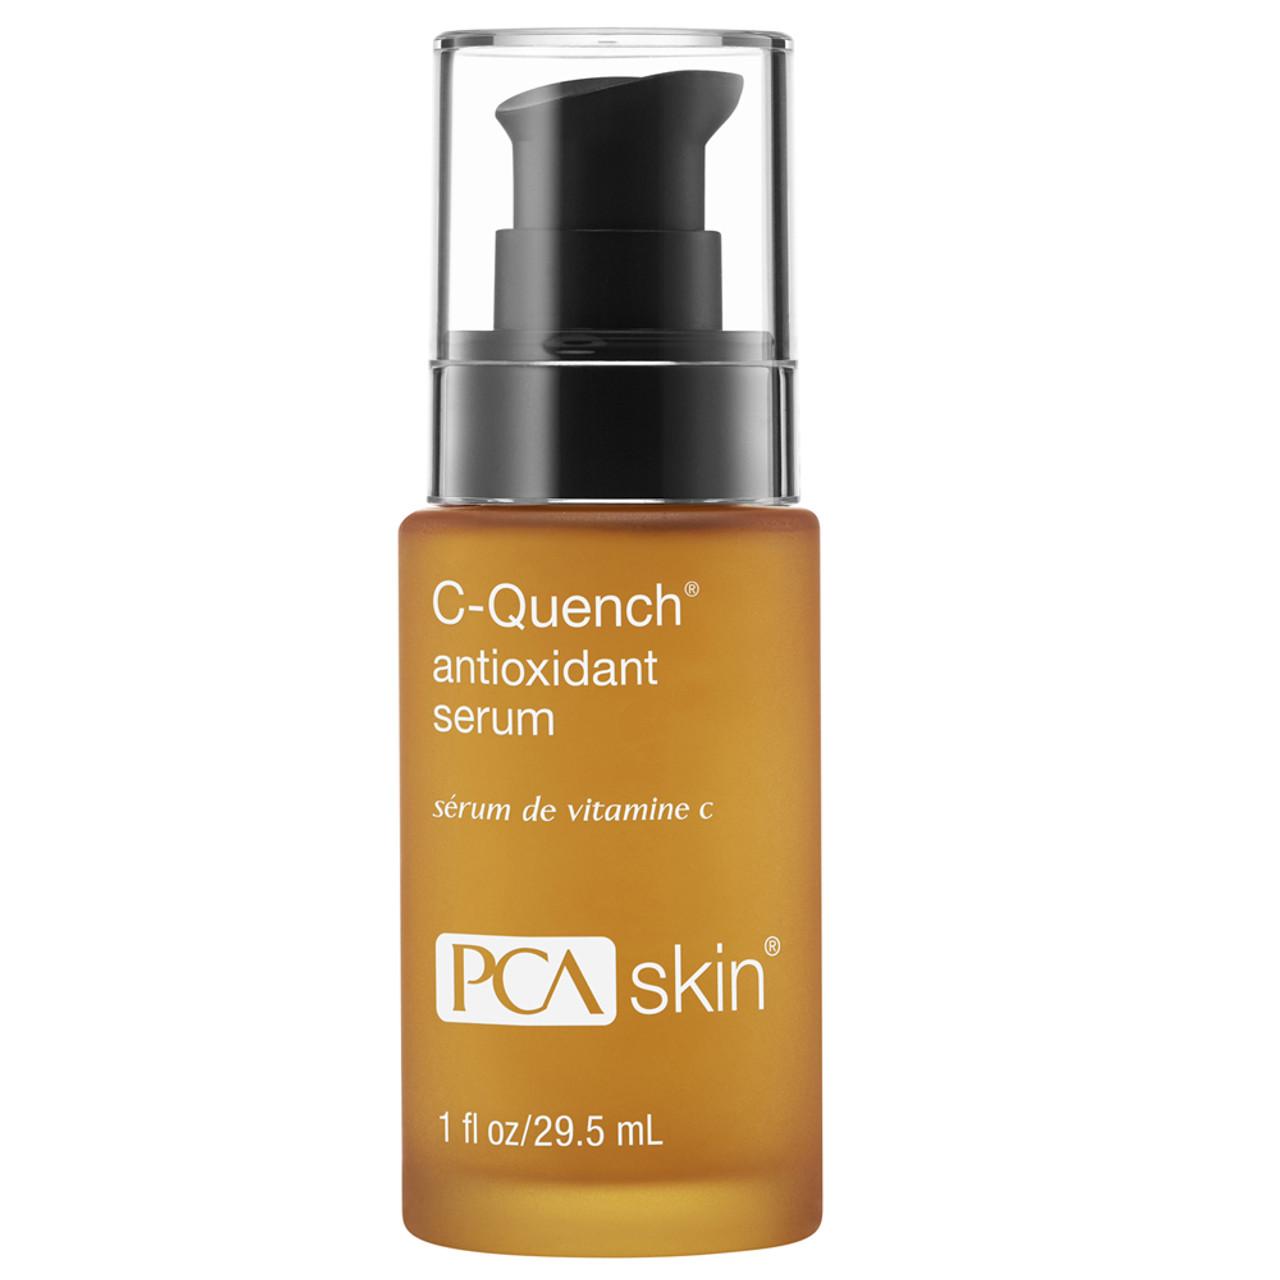 PCA Skin C-Quench Antioxidant Serum (pHaze 15+)